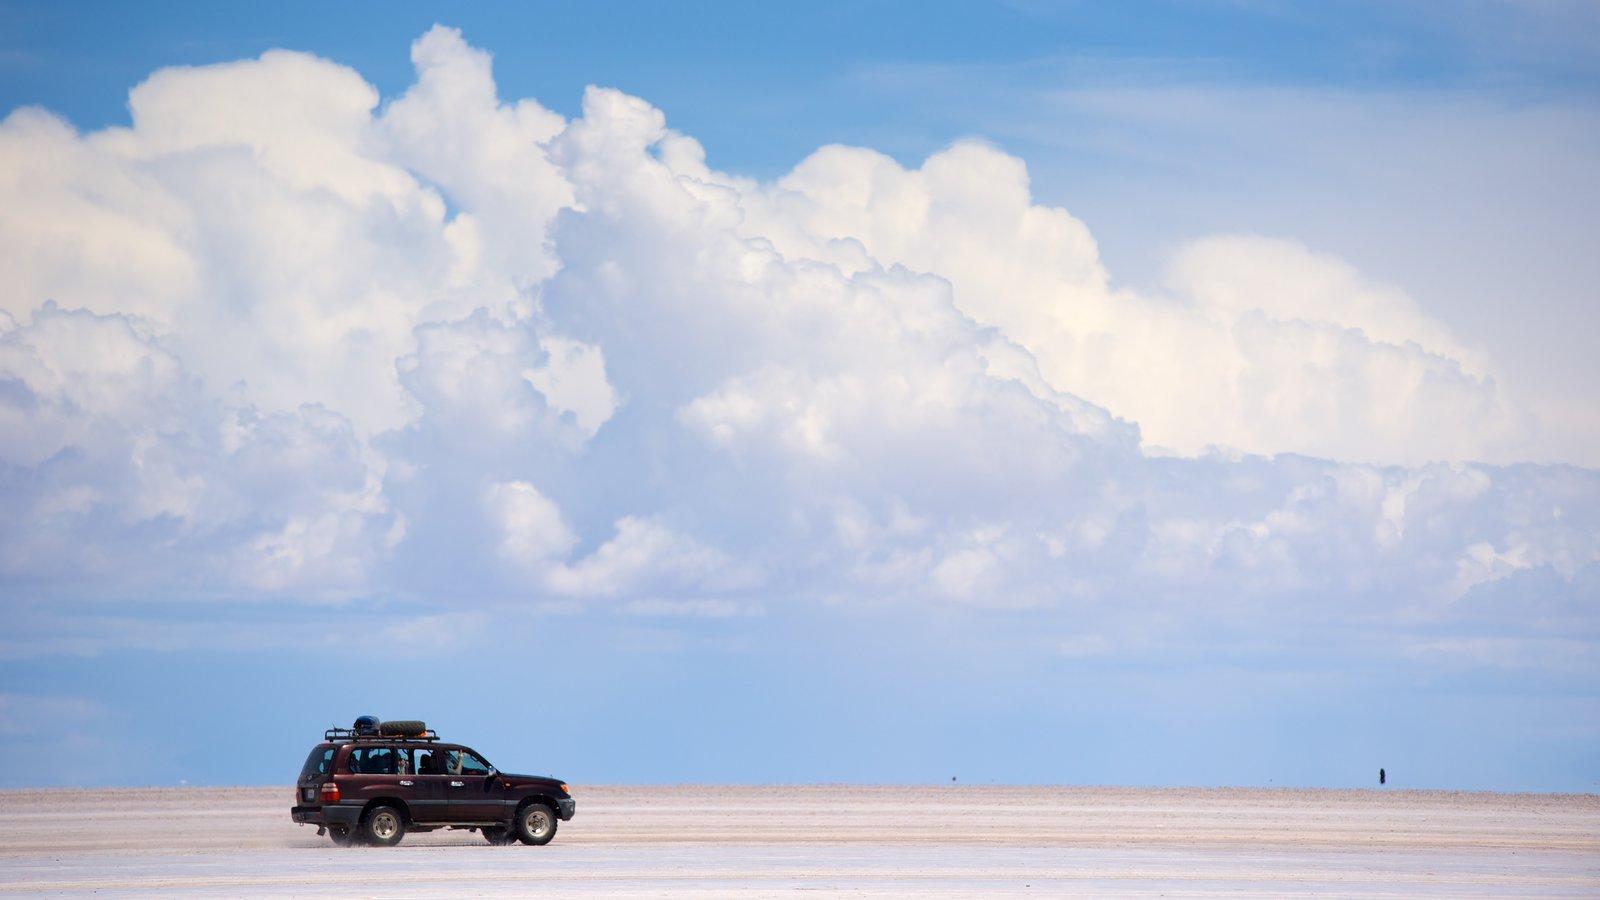 Salar de Uyuni caracterizando cenas tranquilas e paisagem